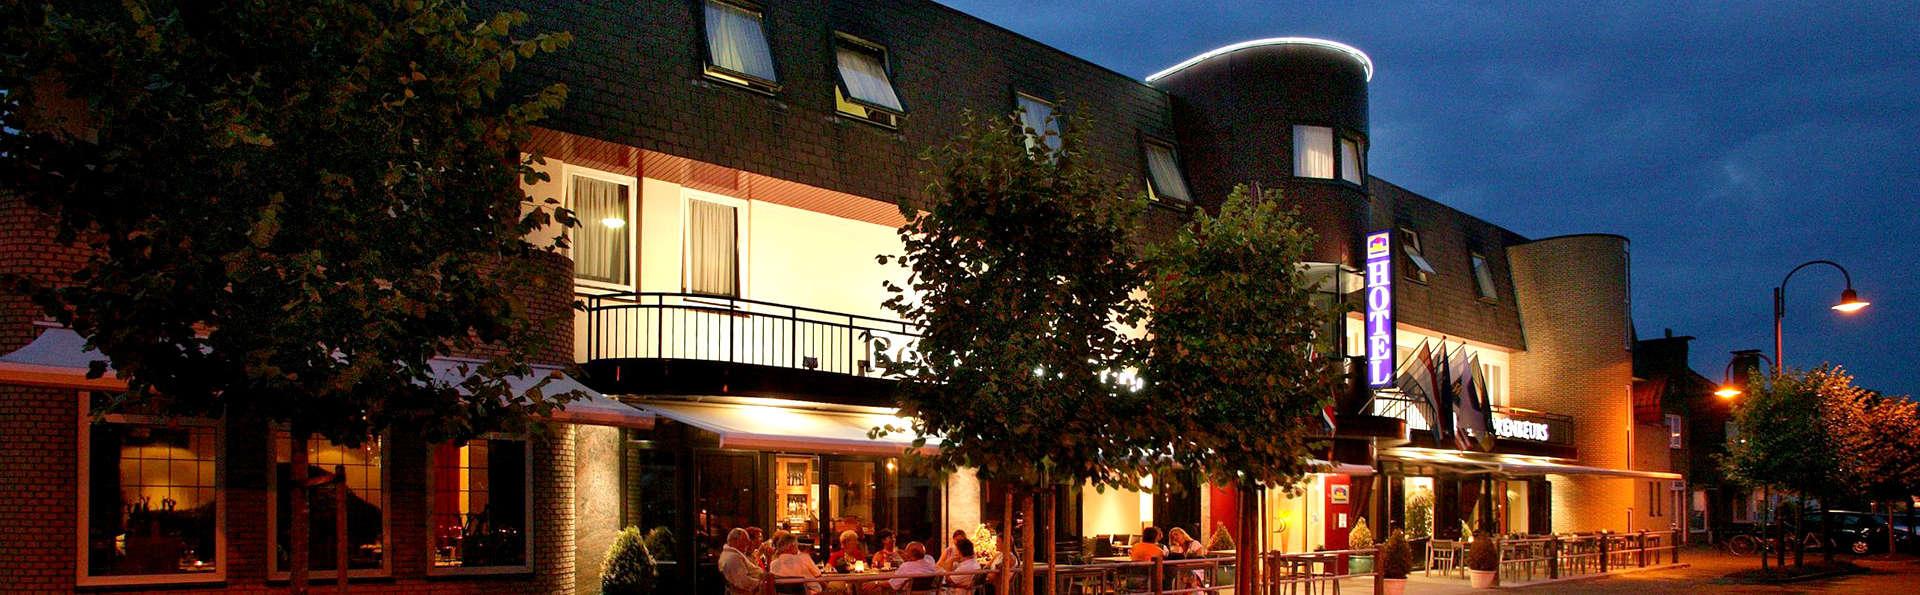 Best Western Hotel de Korenbeurs - Edit_Front2.jpg